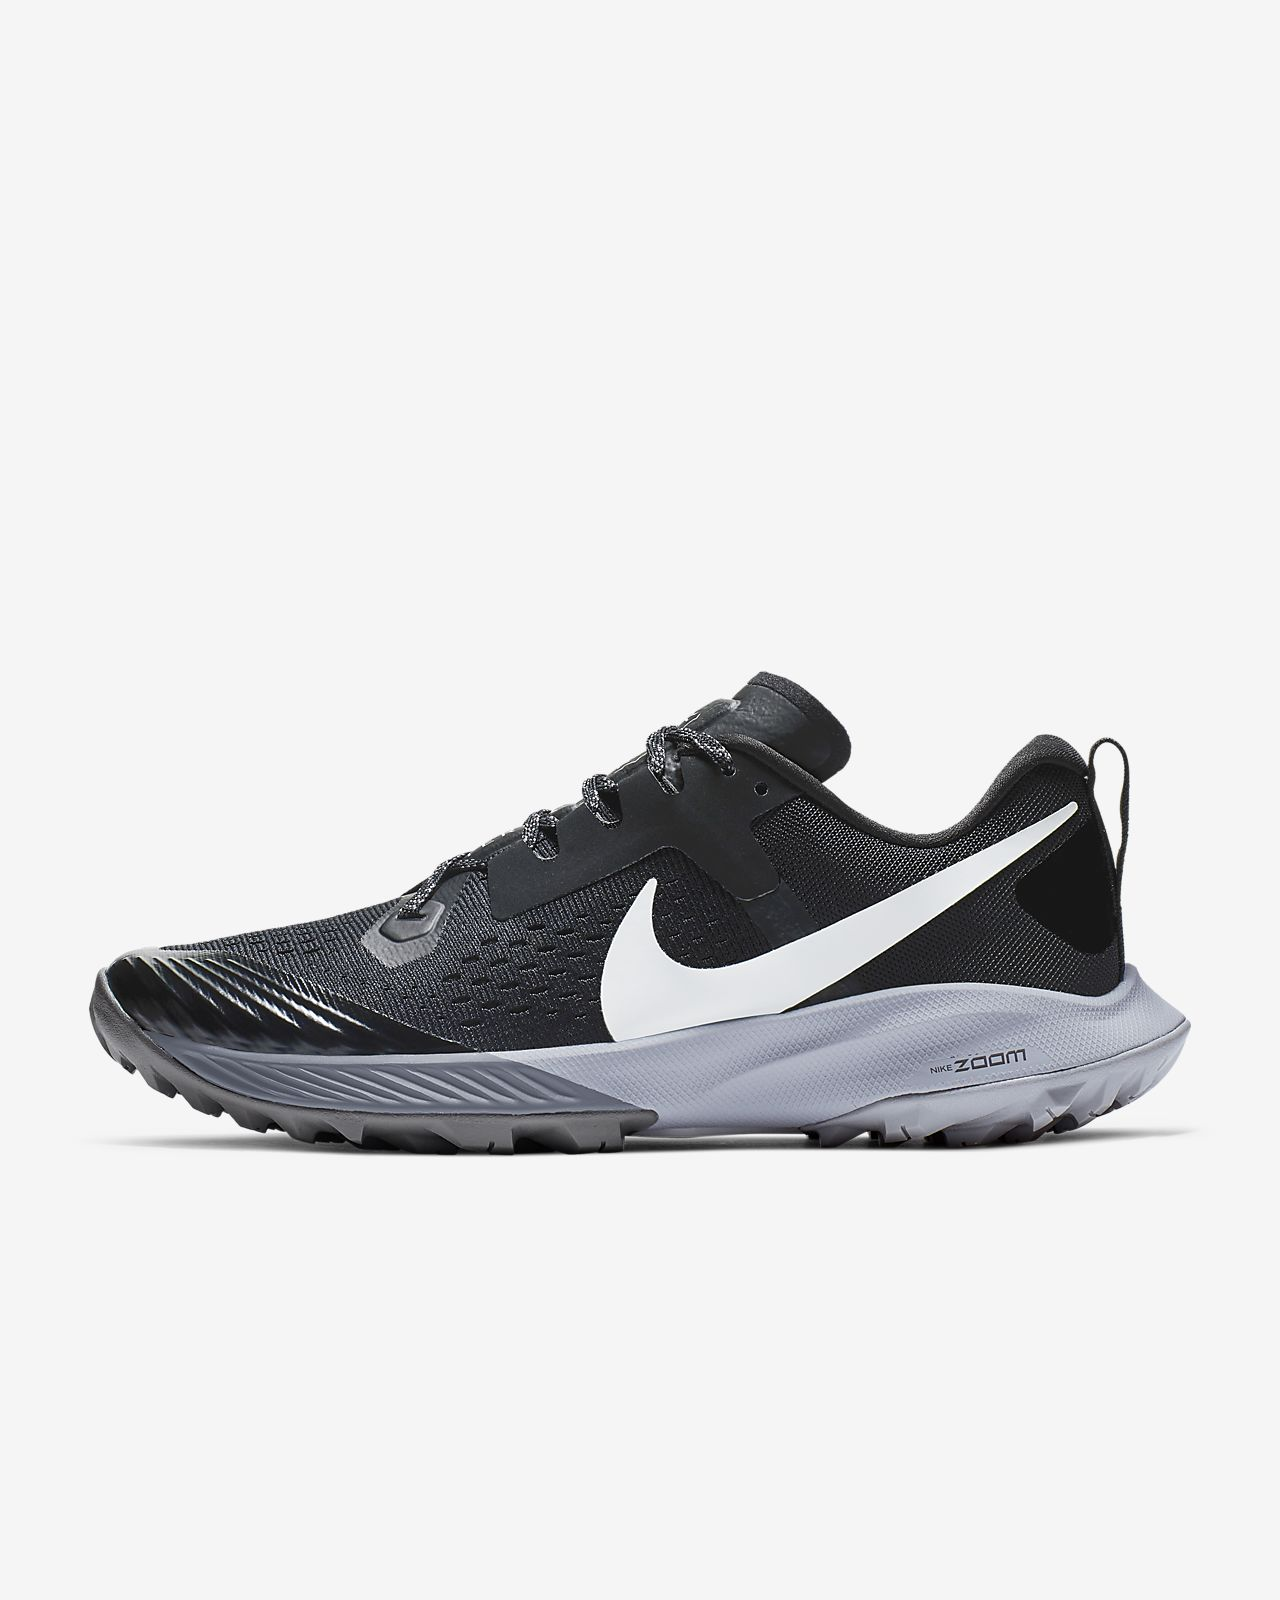 Calzado de trail running para mujer Nike Air Zoom Terra Kiger 5